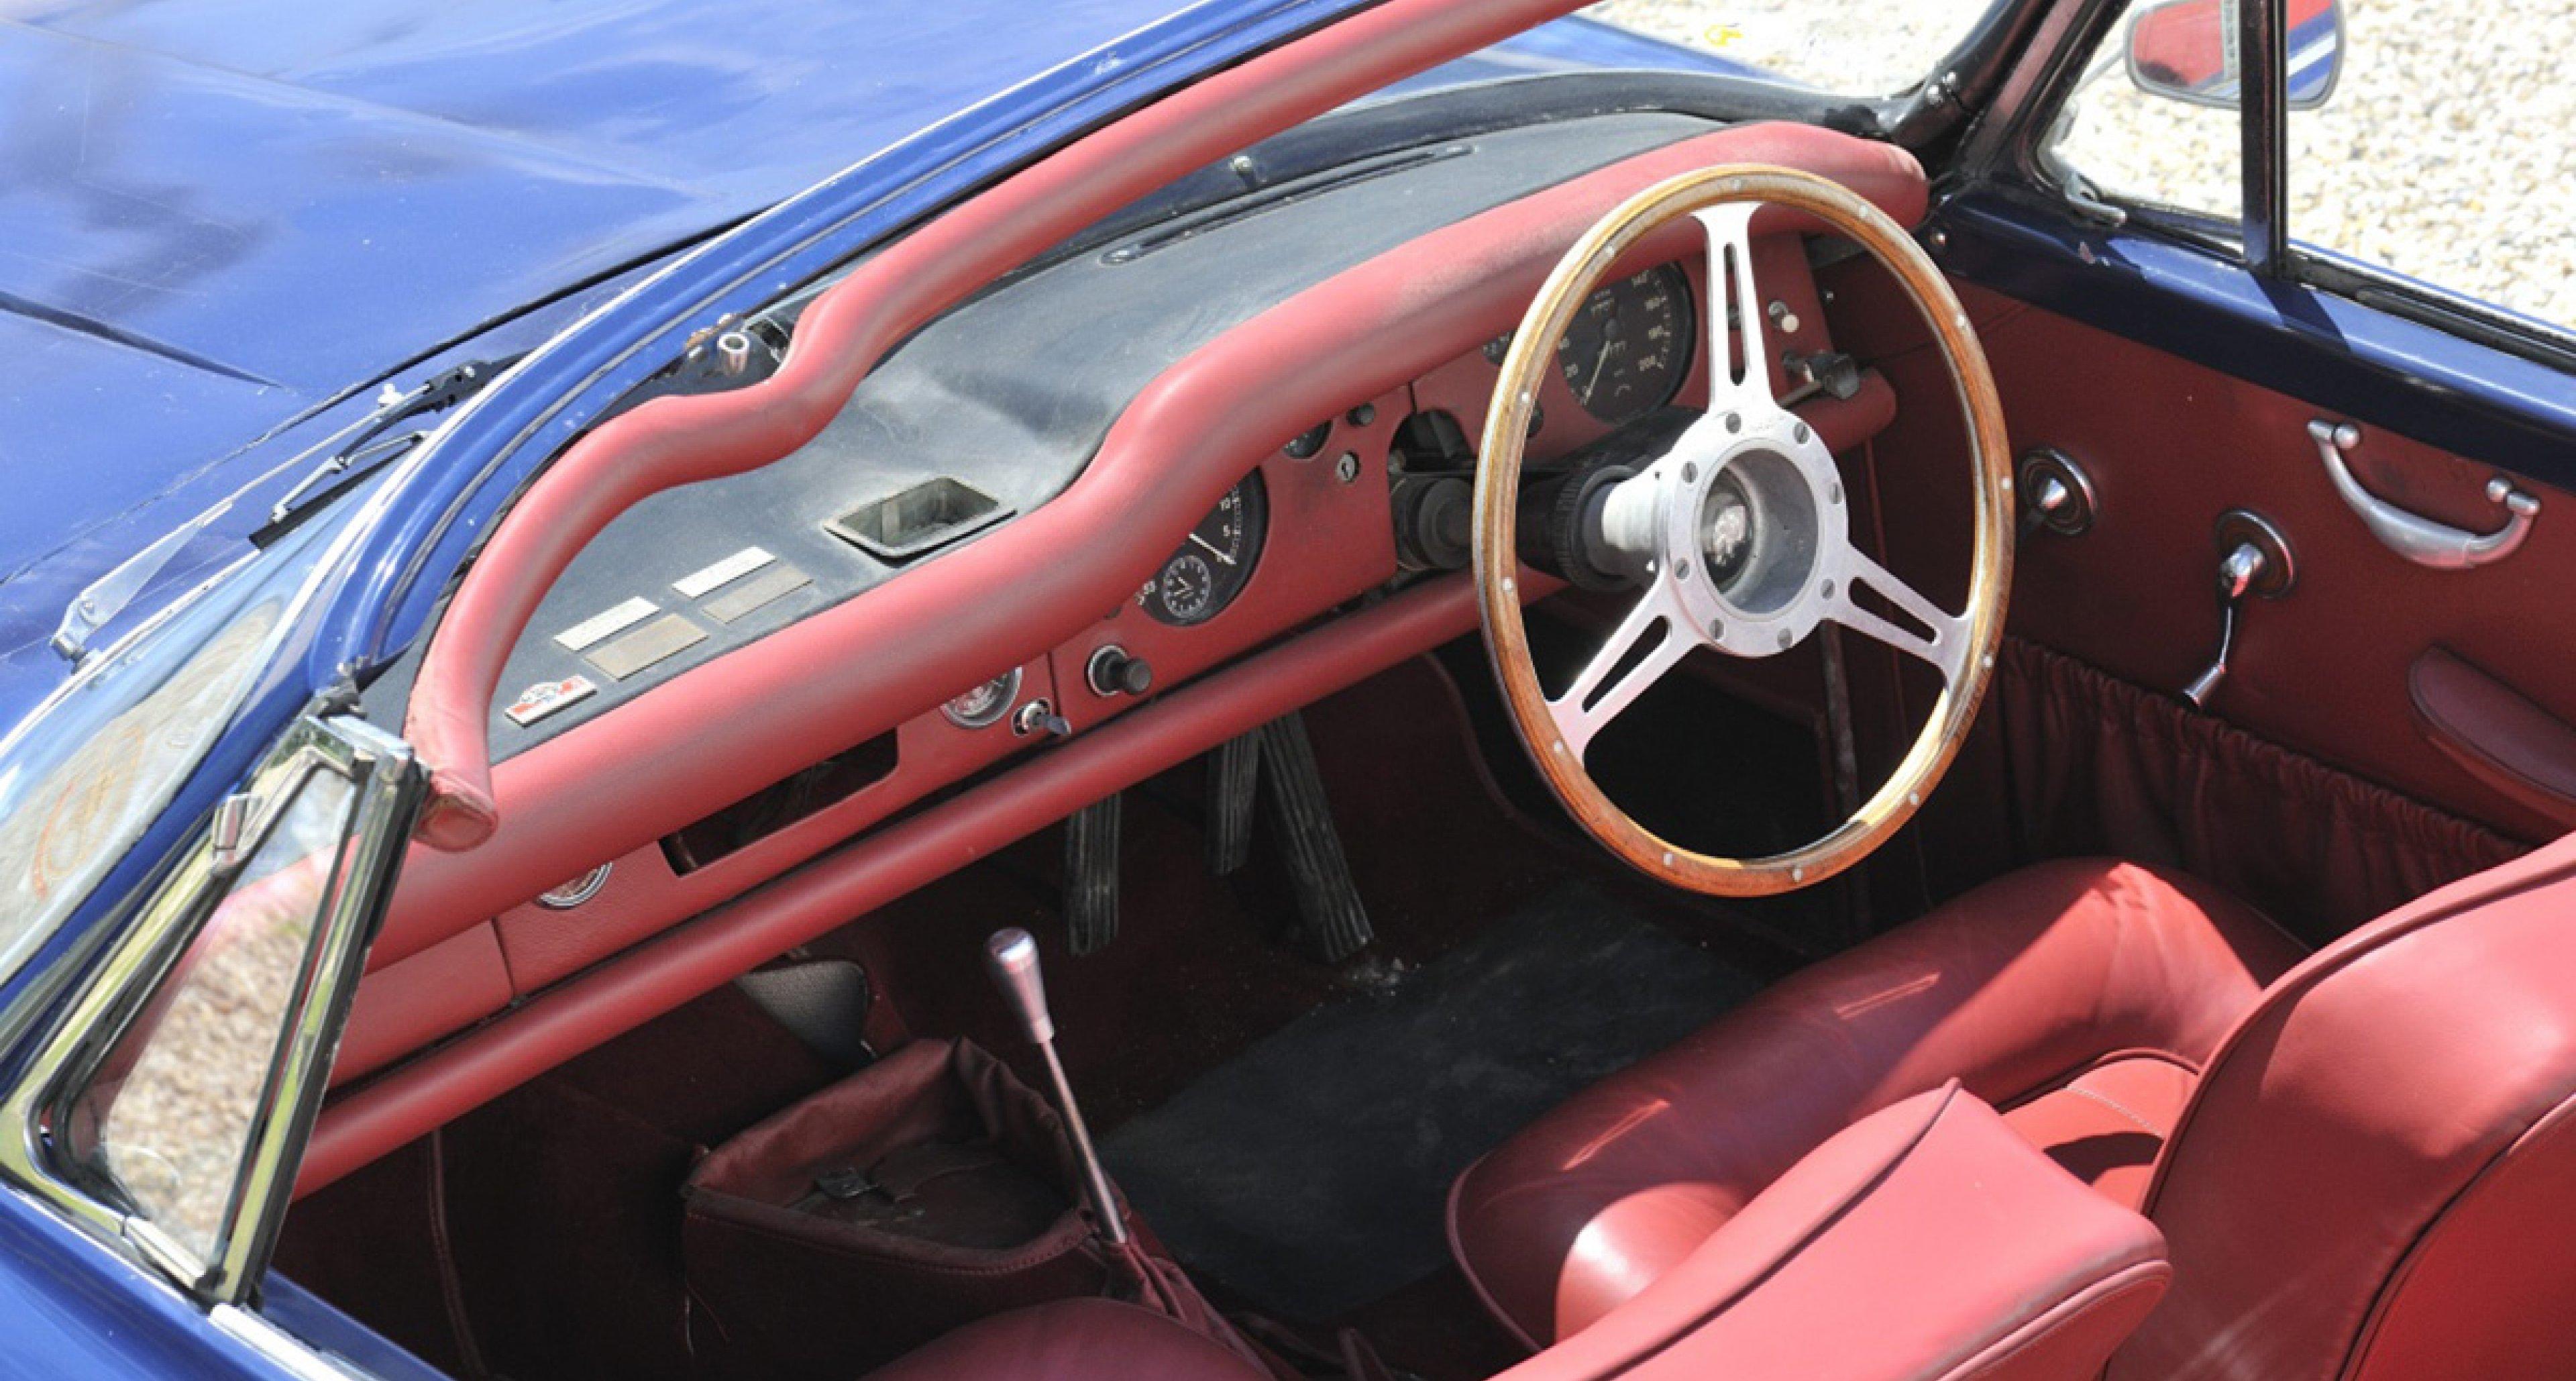 1954 Jaguar Mark VII Ghia-Aigle - Osenat at the Grand Parquet auction 2014